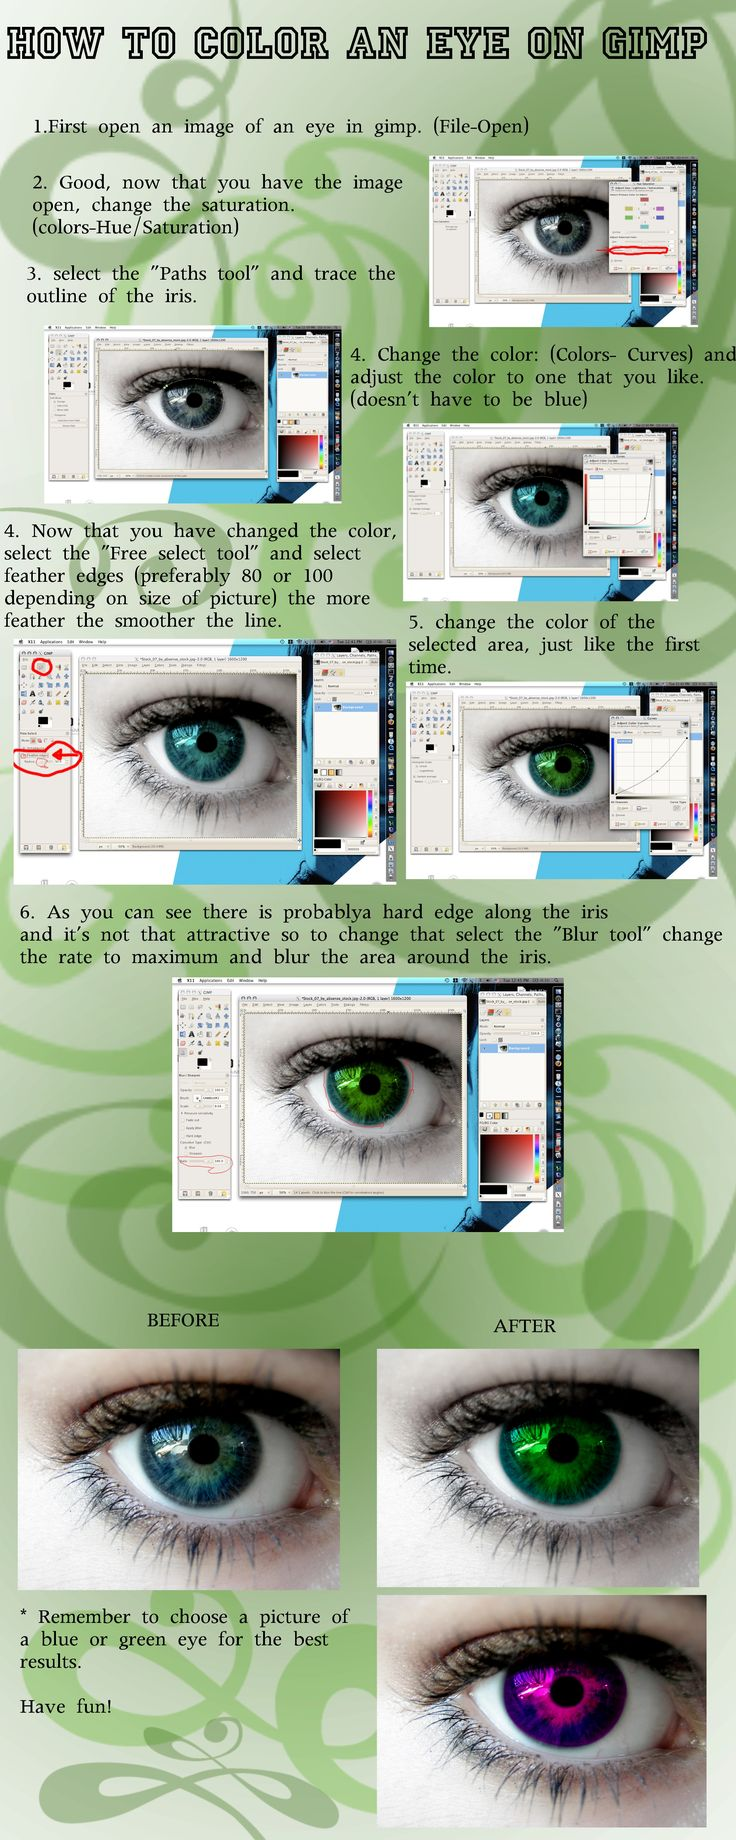 Free online photo editor selective coloring - Eye Coloring Tutorial On Gimp By Evolved Monkey Deviantart Com On Deviantart